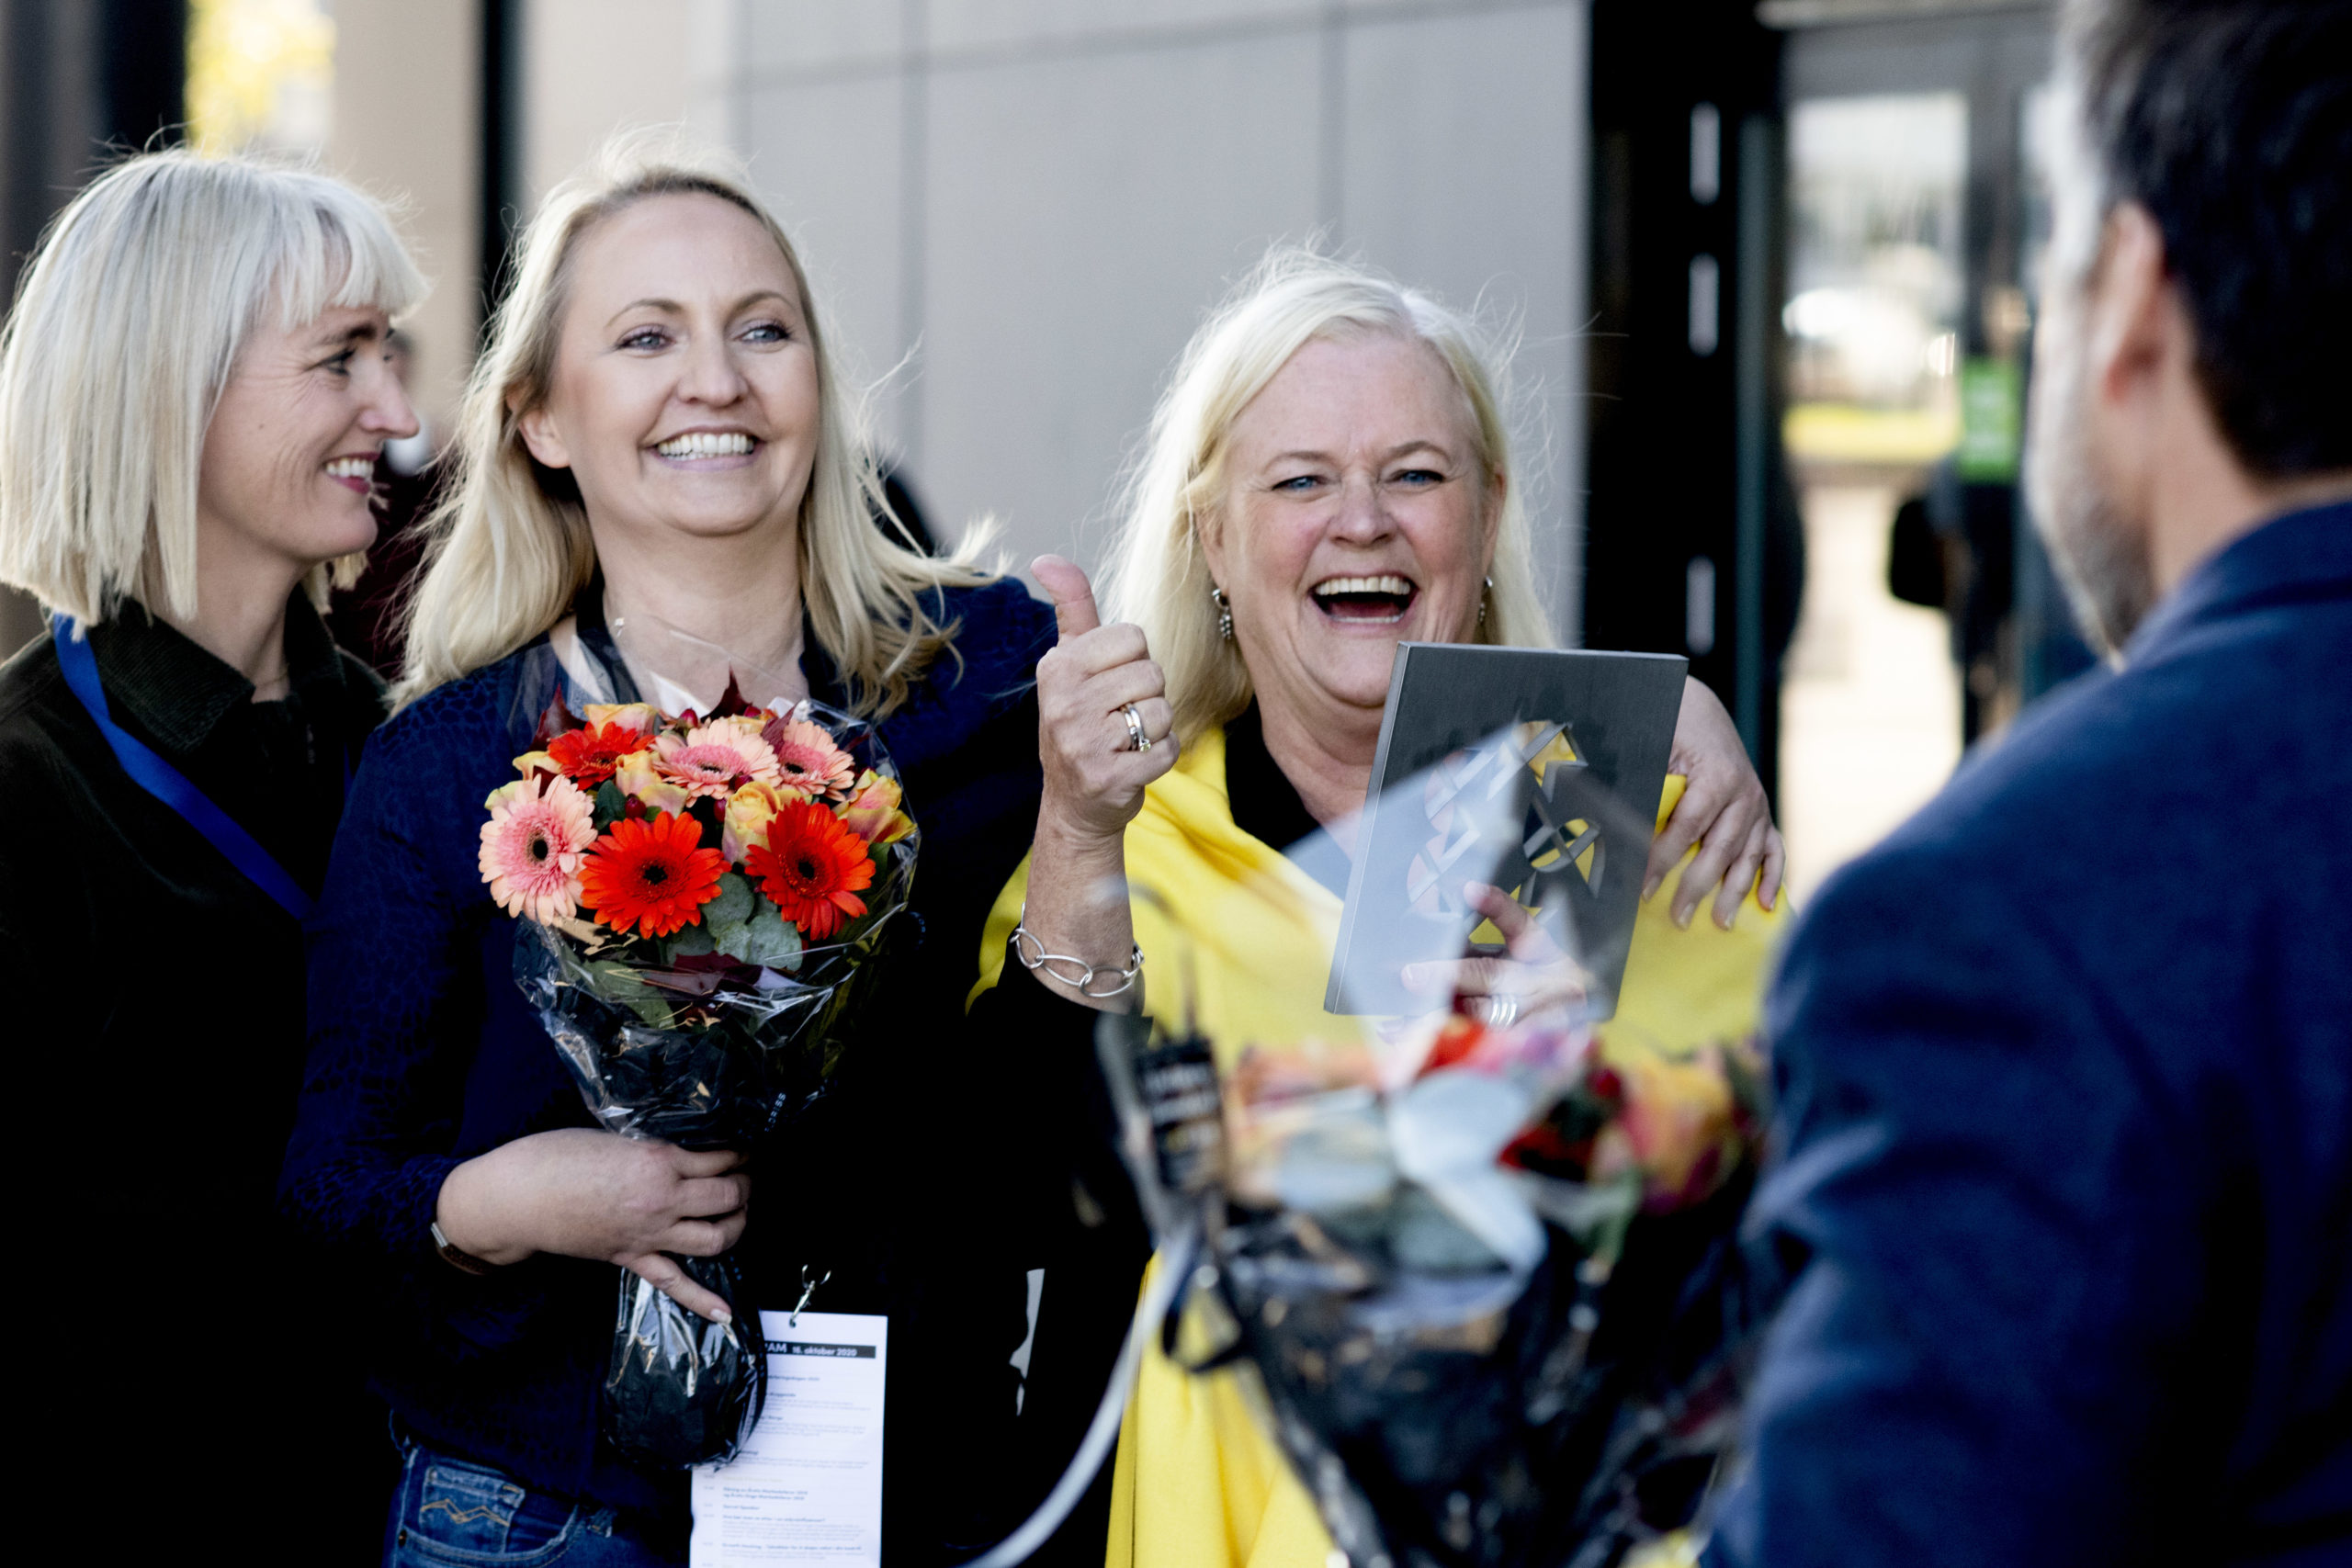 Pål Hjort Berge (Fasett), Ingrid Fure Schøpp, Heidi Elin Nupen og Marit Tesdal (Sandnes Sparebank). Foto: Jan Inge Haga